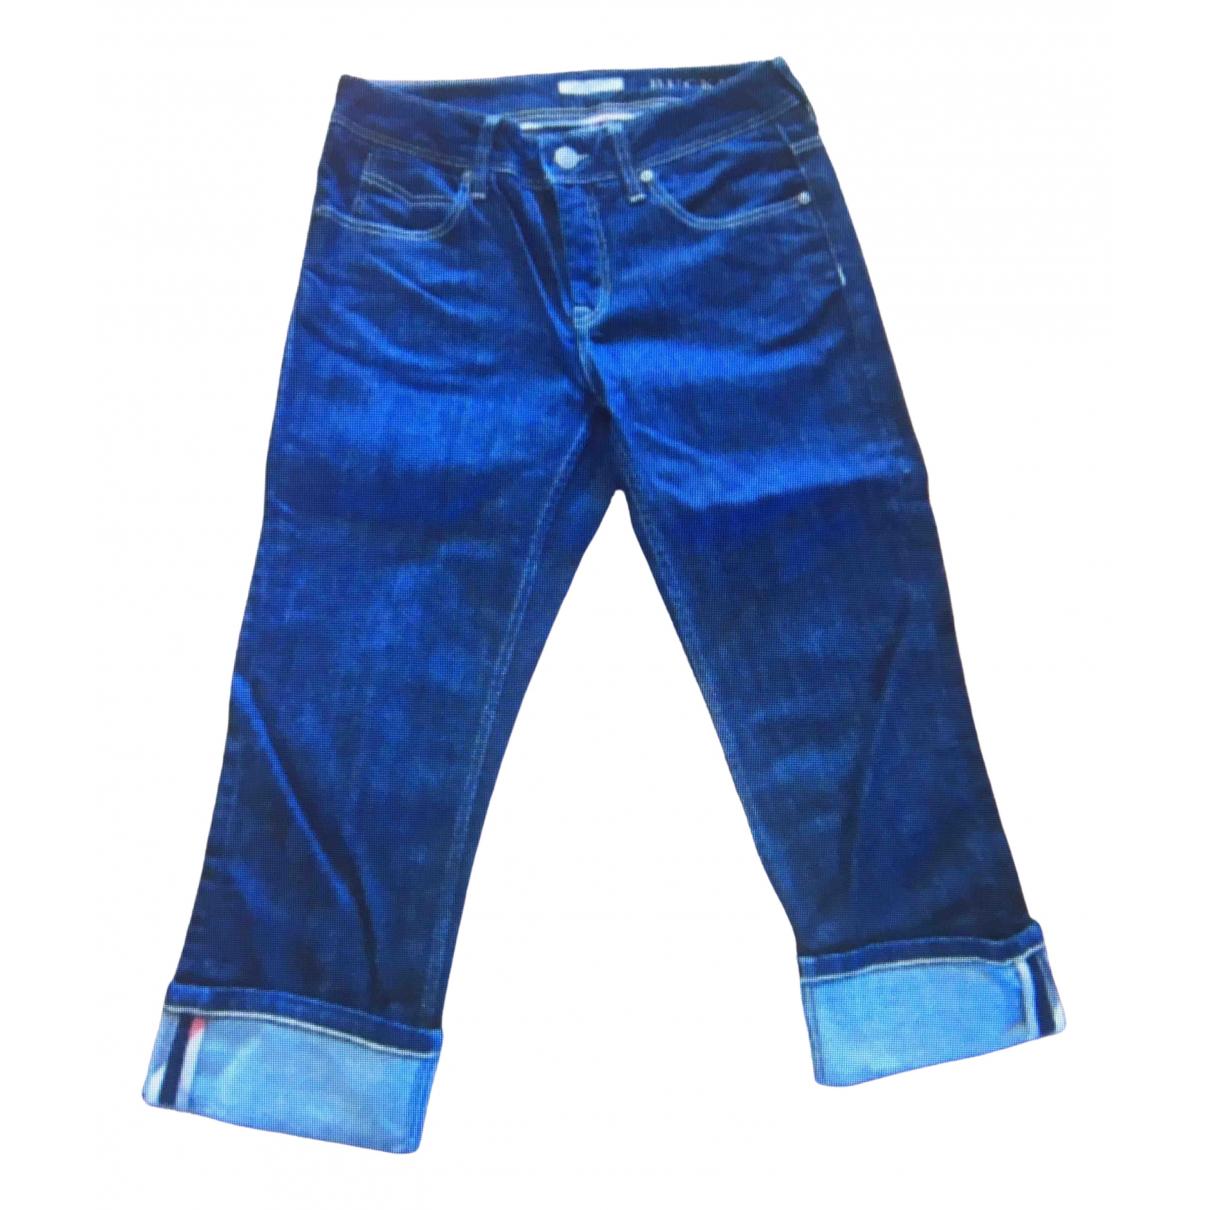 Burberry \N Blue Denim - Jeans Trousers for Women 38 FR